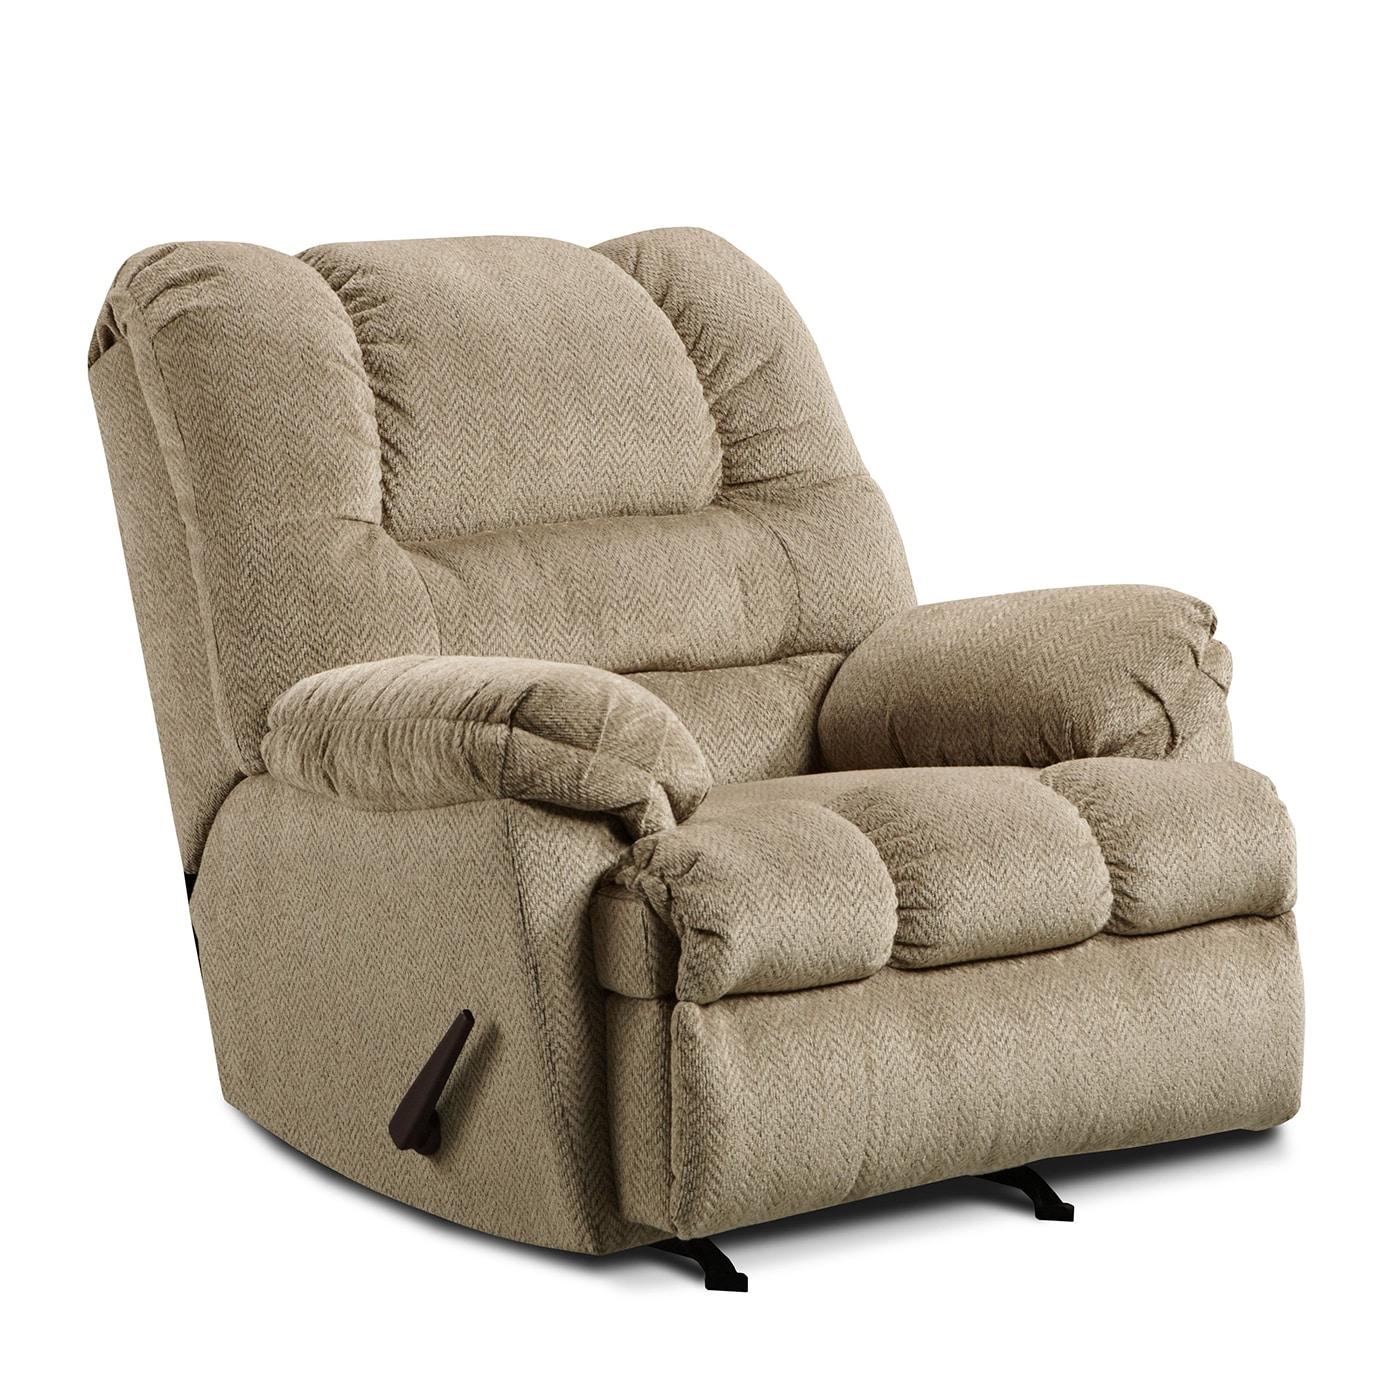 Simmons Upholstery Zig Zag Rocker Recliner (Tan), Size Ov...